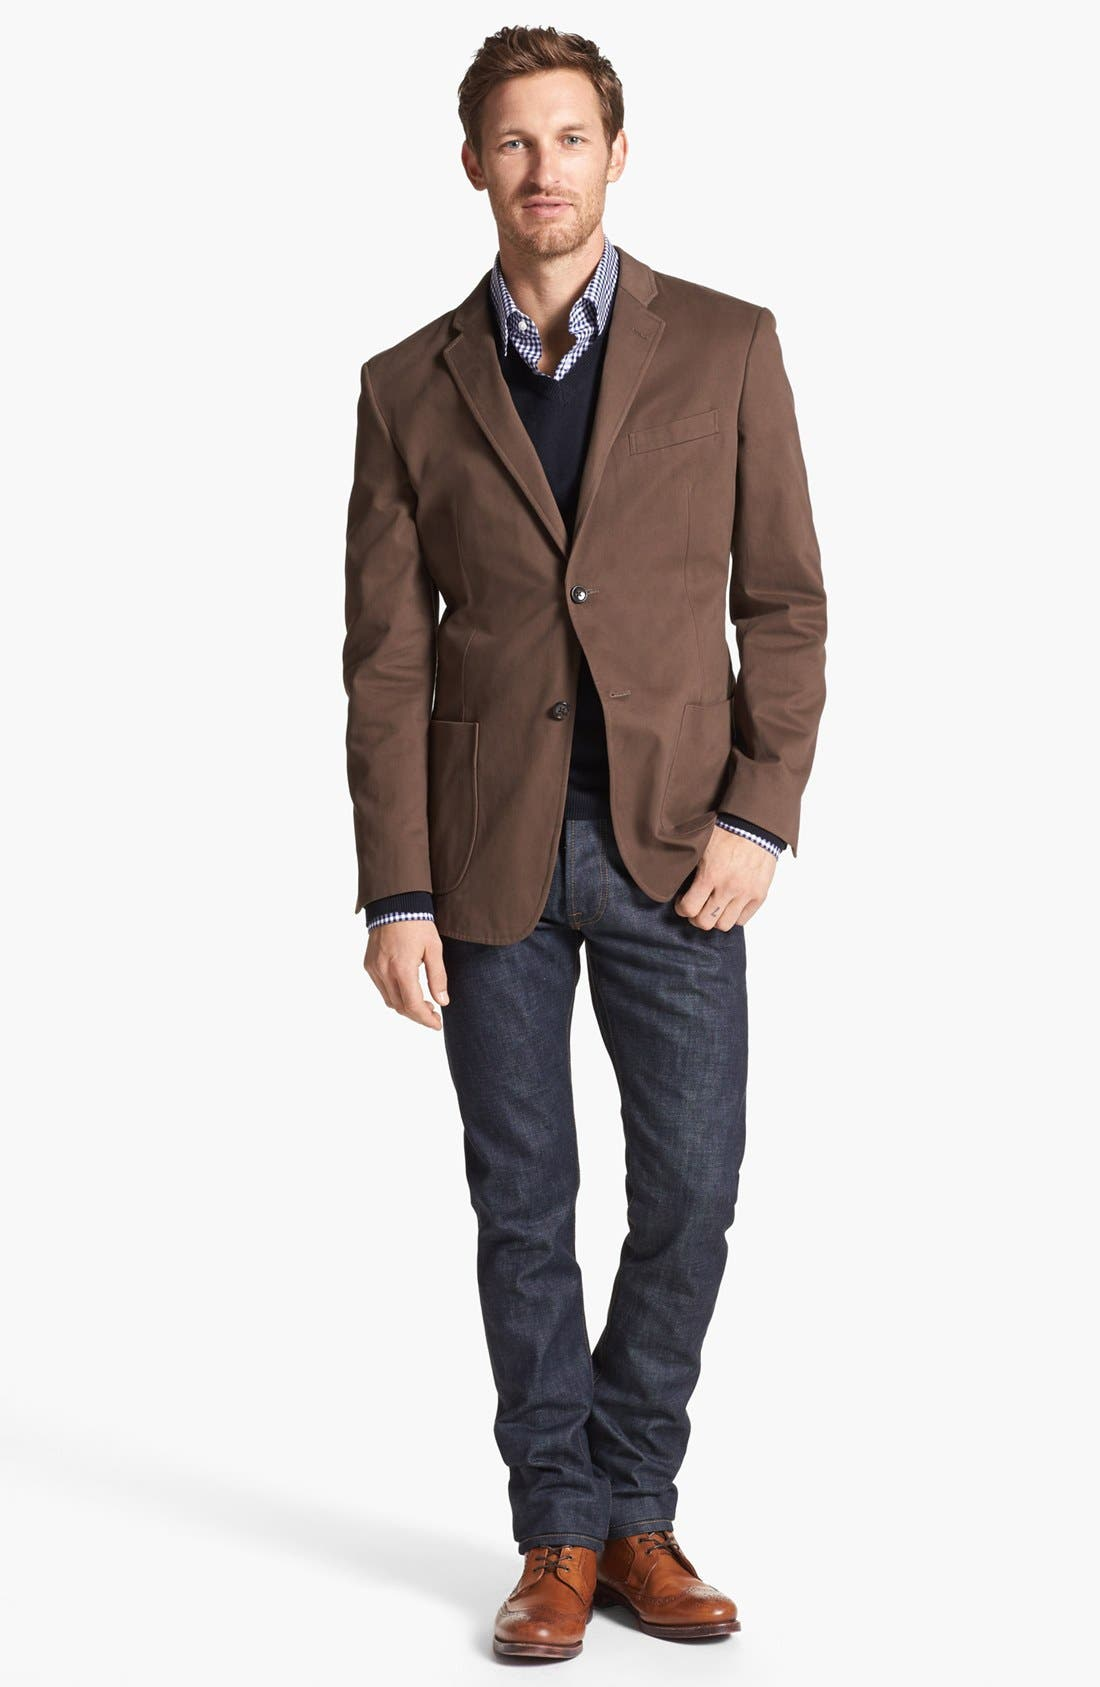 Main Image - Wallin & Bros. Extra Trim Fit Cotton Twill Blazer